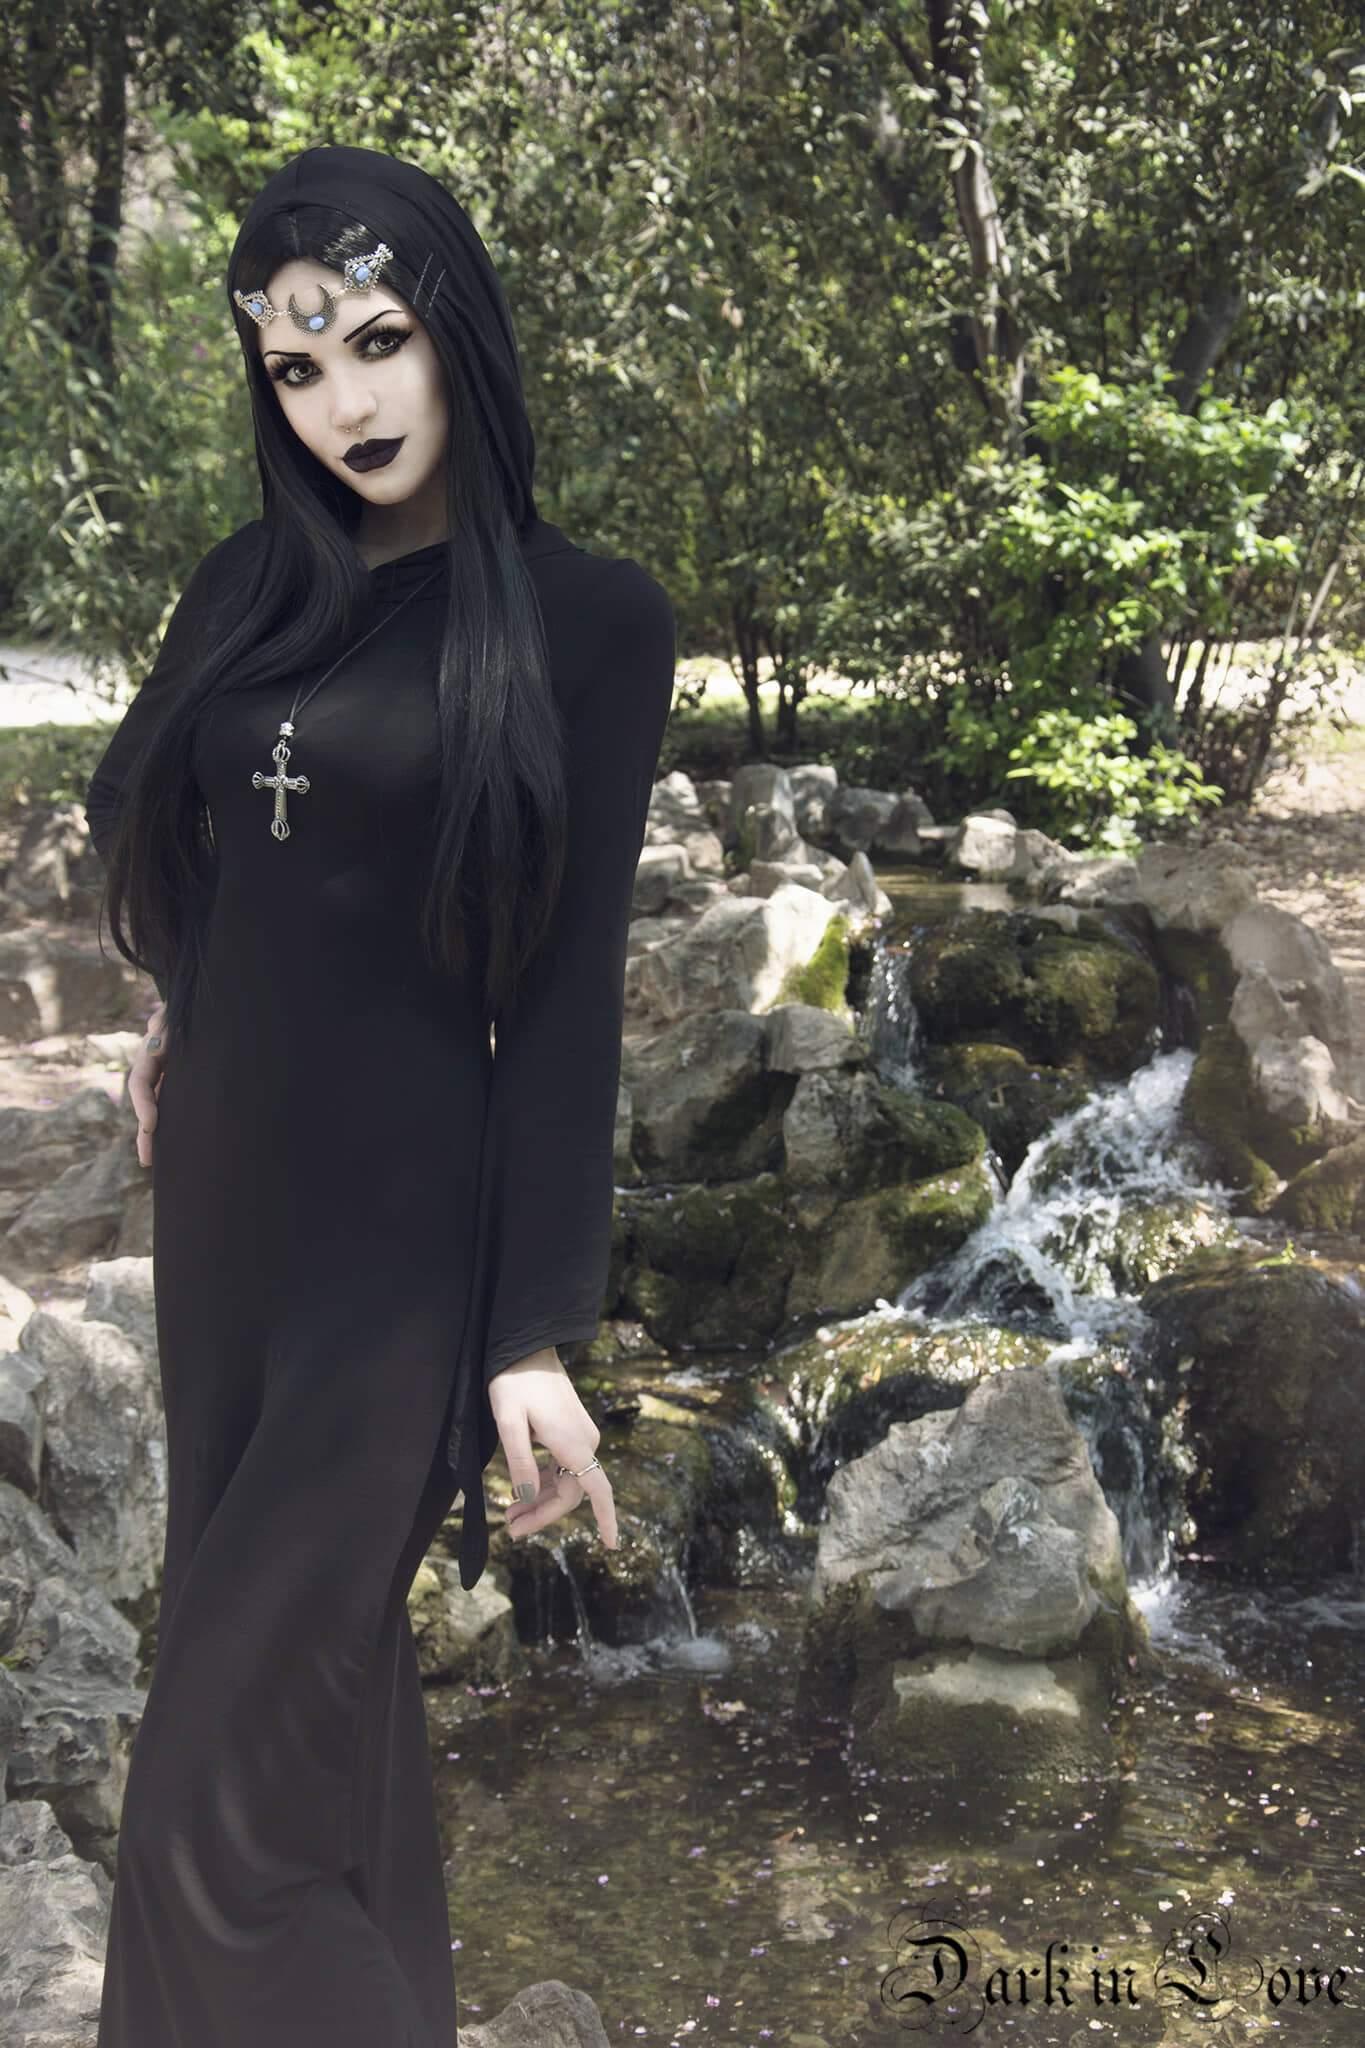 Darkinlove Women Gothic Dress Black Hooded Backless Stage Performance Long Dress